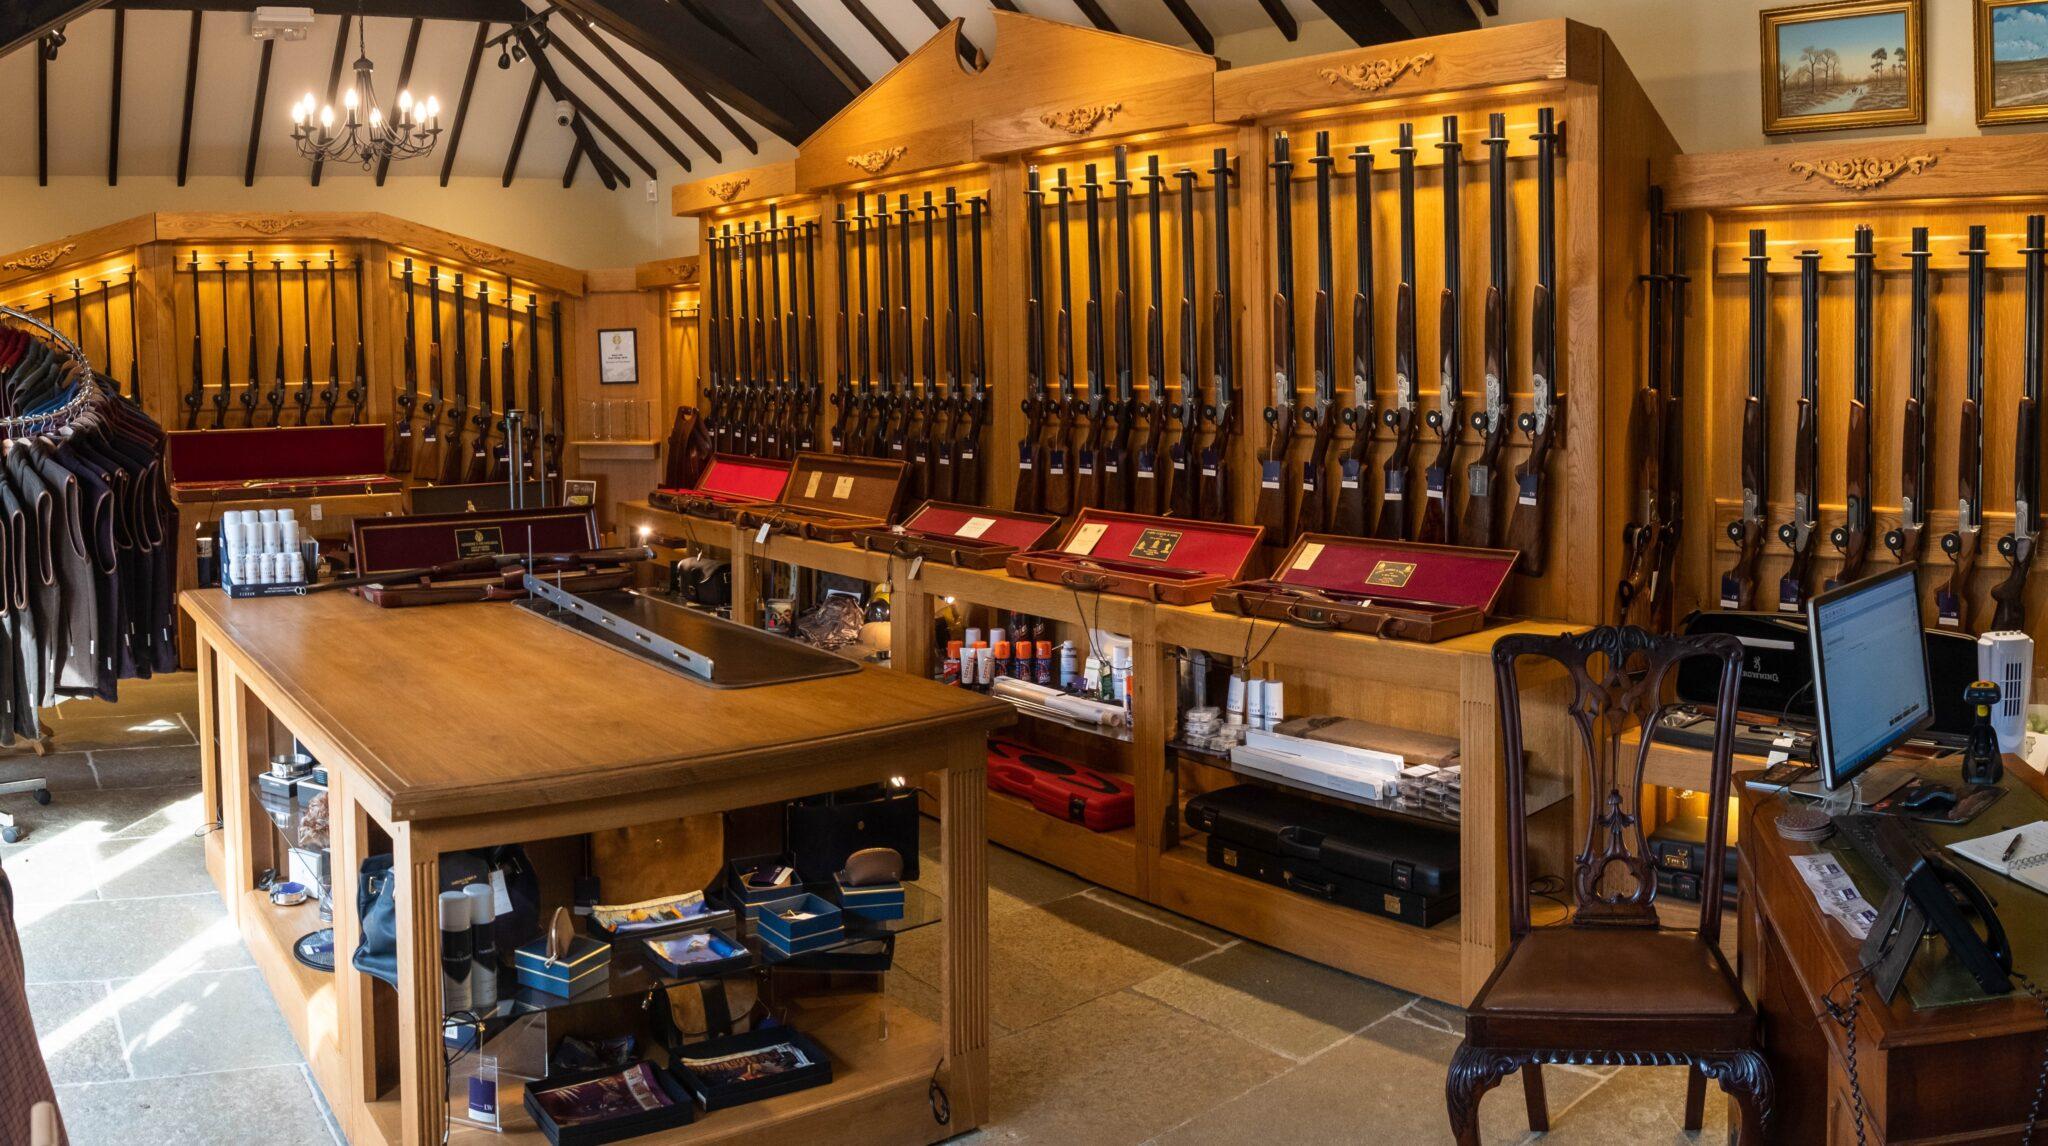 Sportarm at Lady's Wood gun room